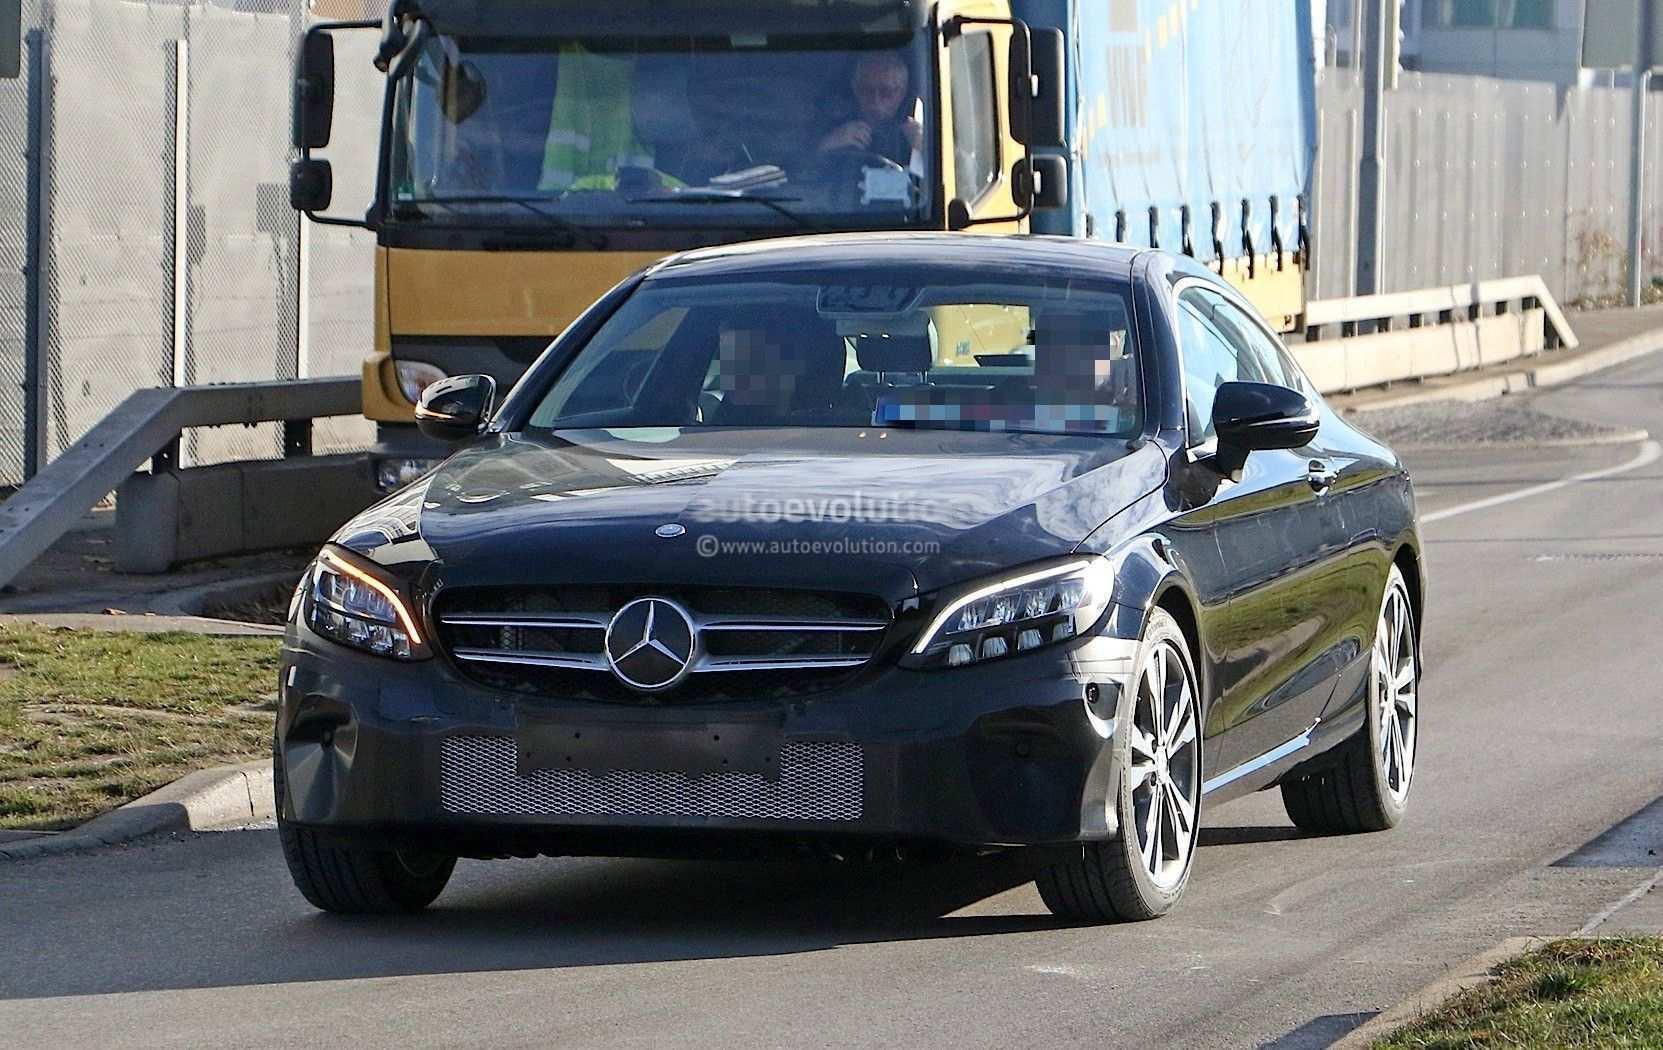 59 Great Mercedes Benz C Class Facelift 2019 Picture with Mercedes Benz C Class Facelift 2019